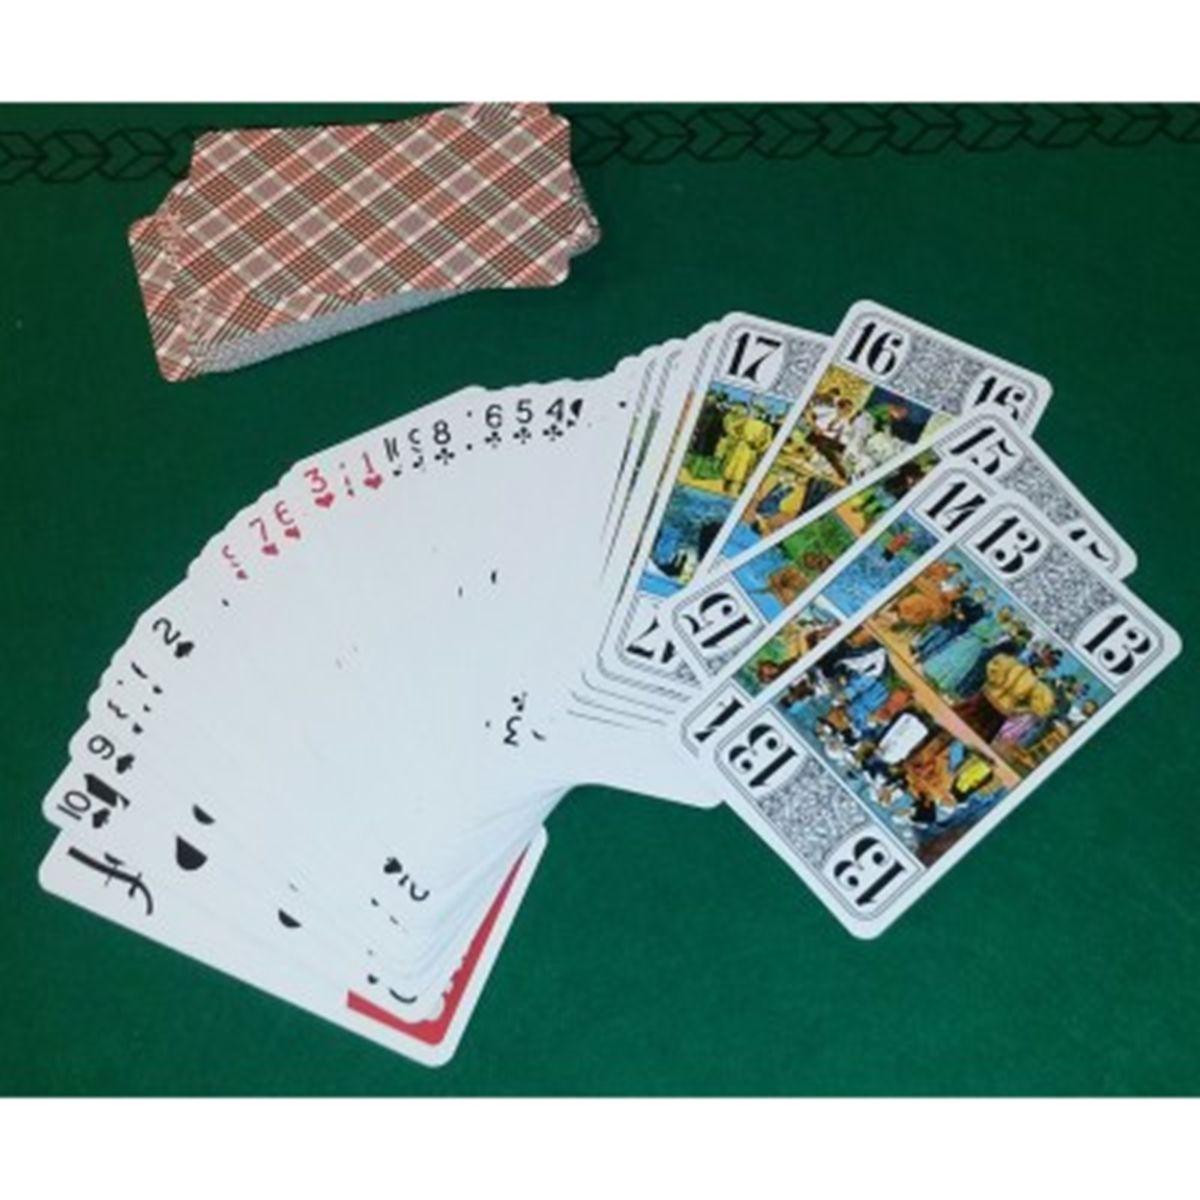 Jeu De Tarot 78 Cartes Jeux De Societe Et Puzzles La Grande Recre